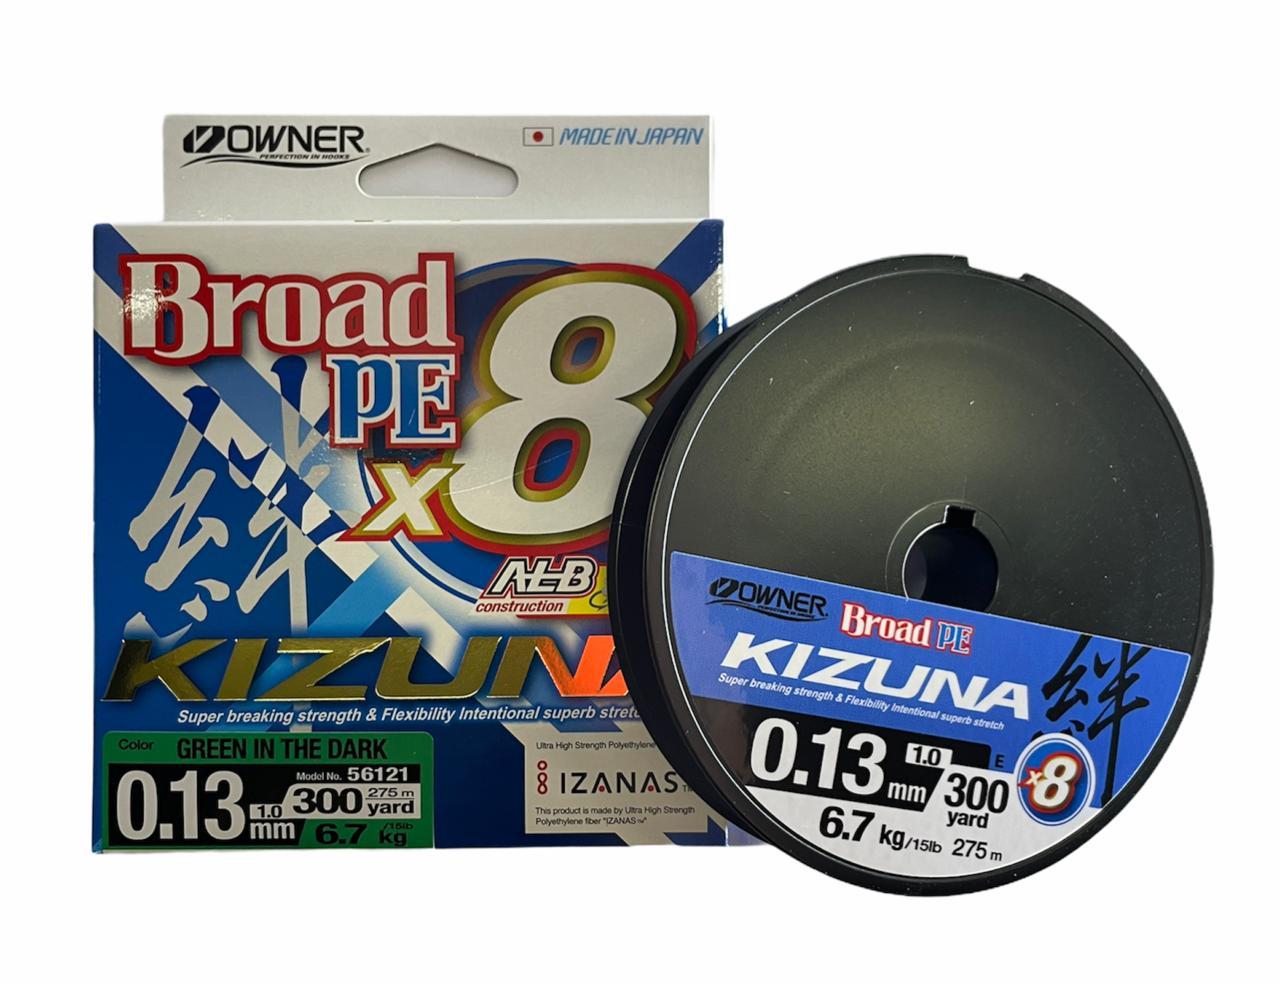 Owner kizuna Broad PE X8 0.13 6.7kg 275m (verde oscuro)